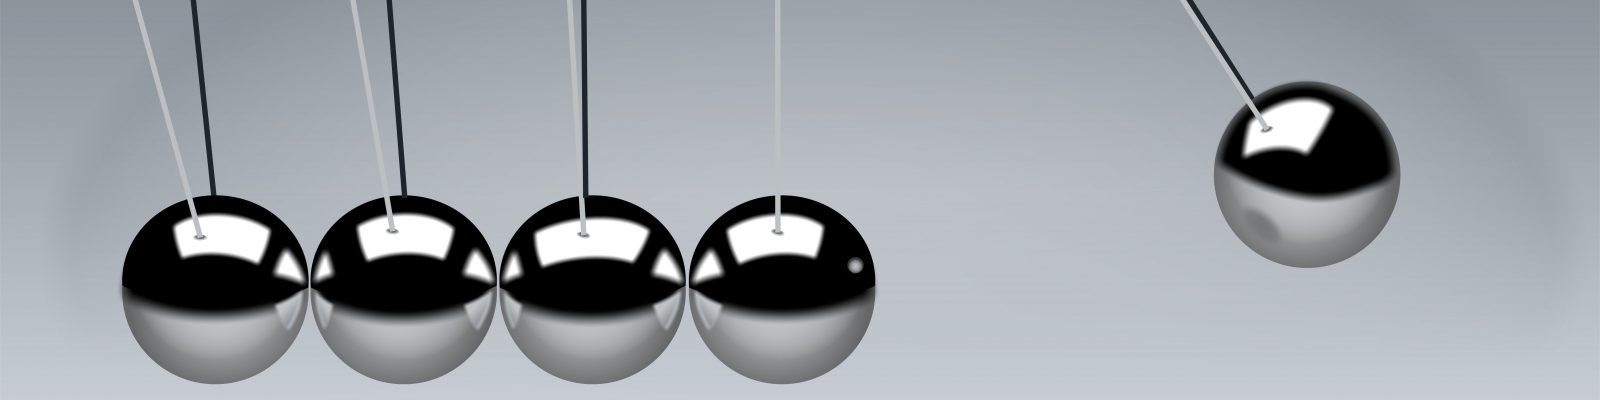 Action-Balls-Black-And-White-60582